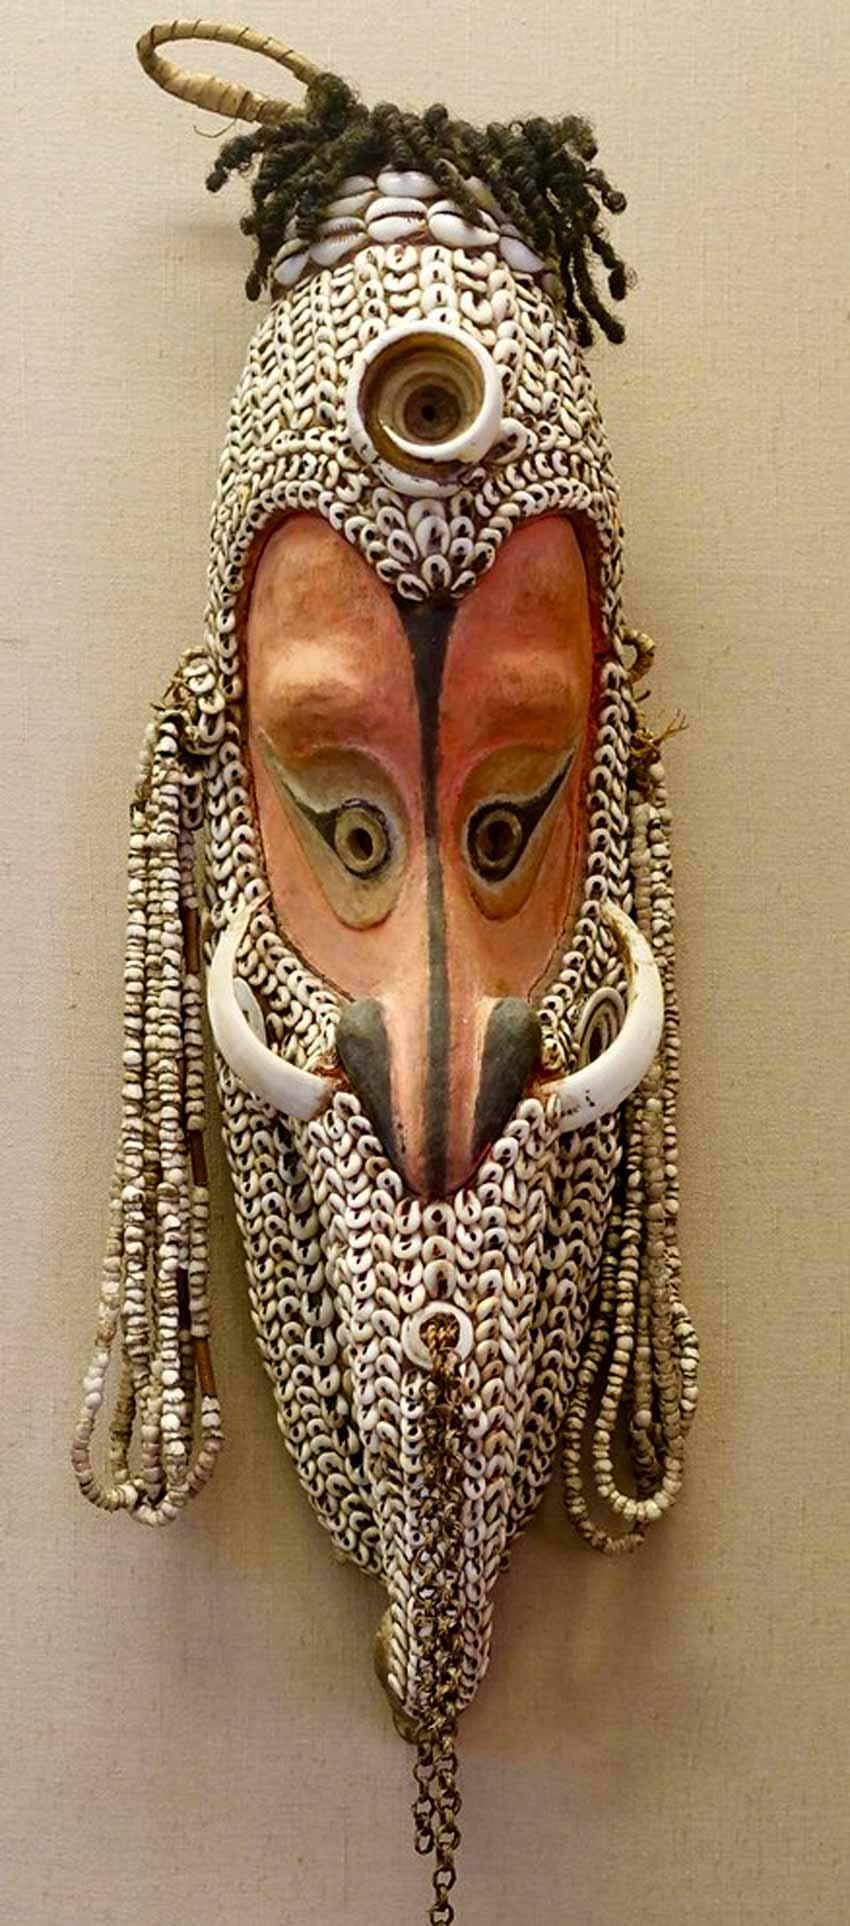 Phong phú mặt nạ Papua New Guinea - 10